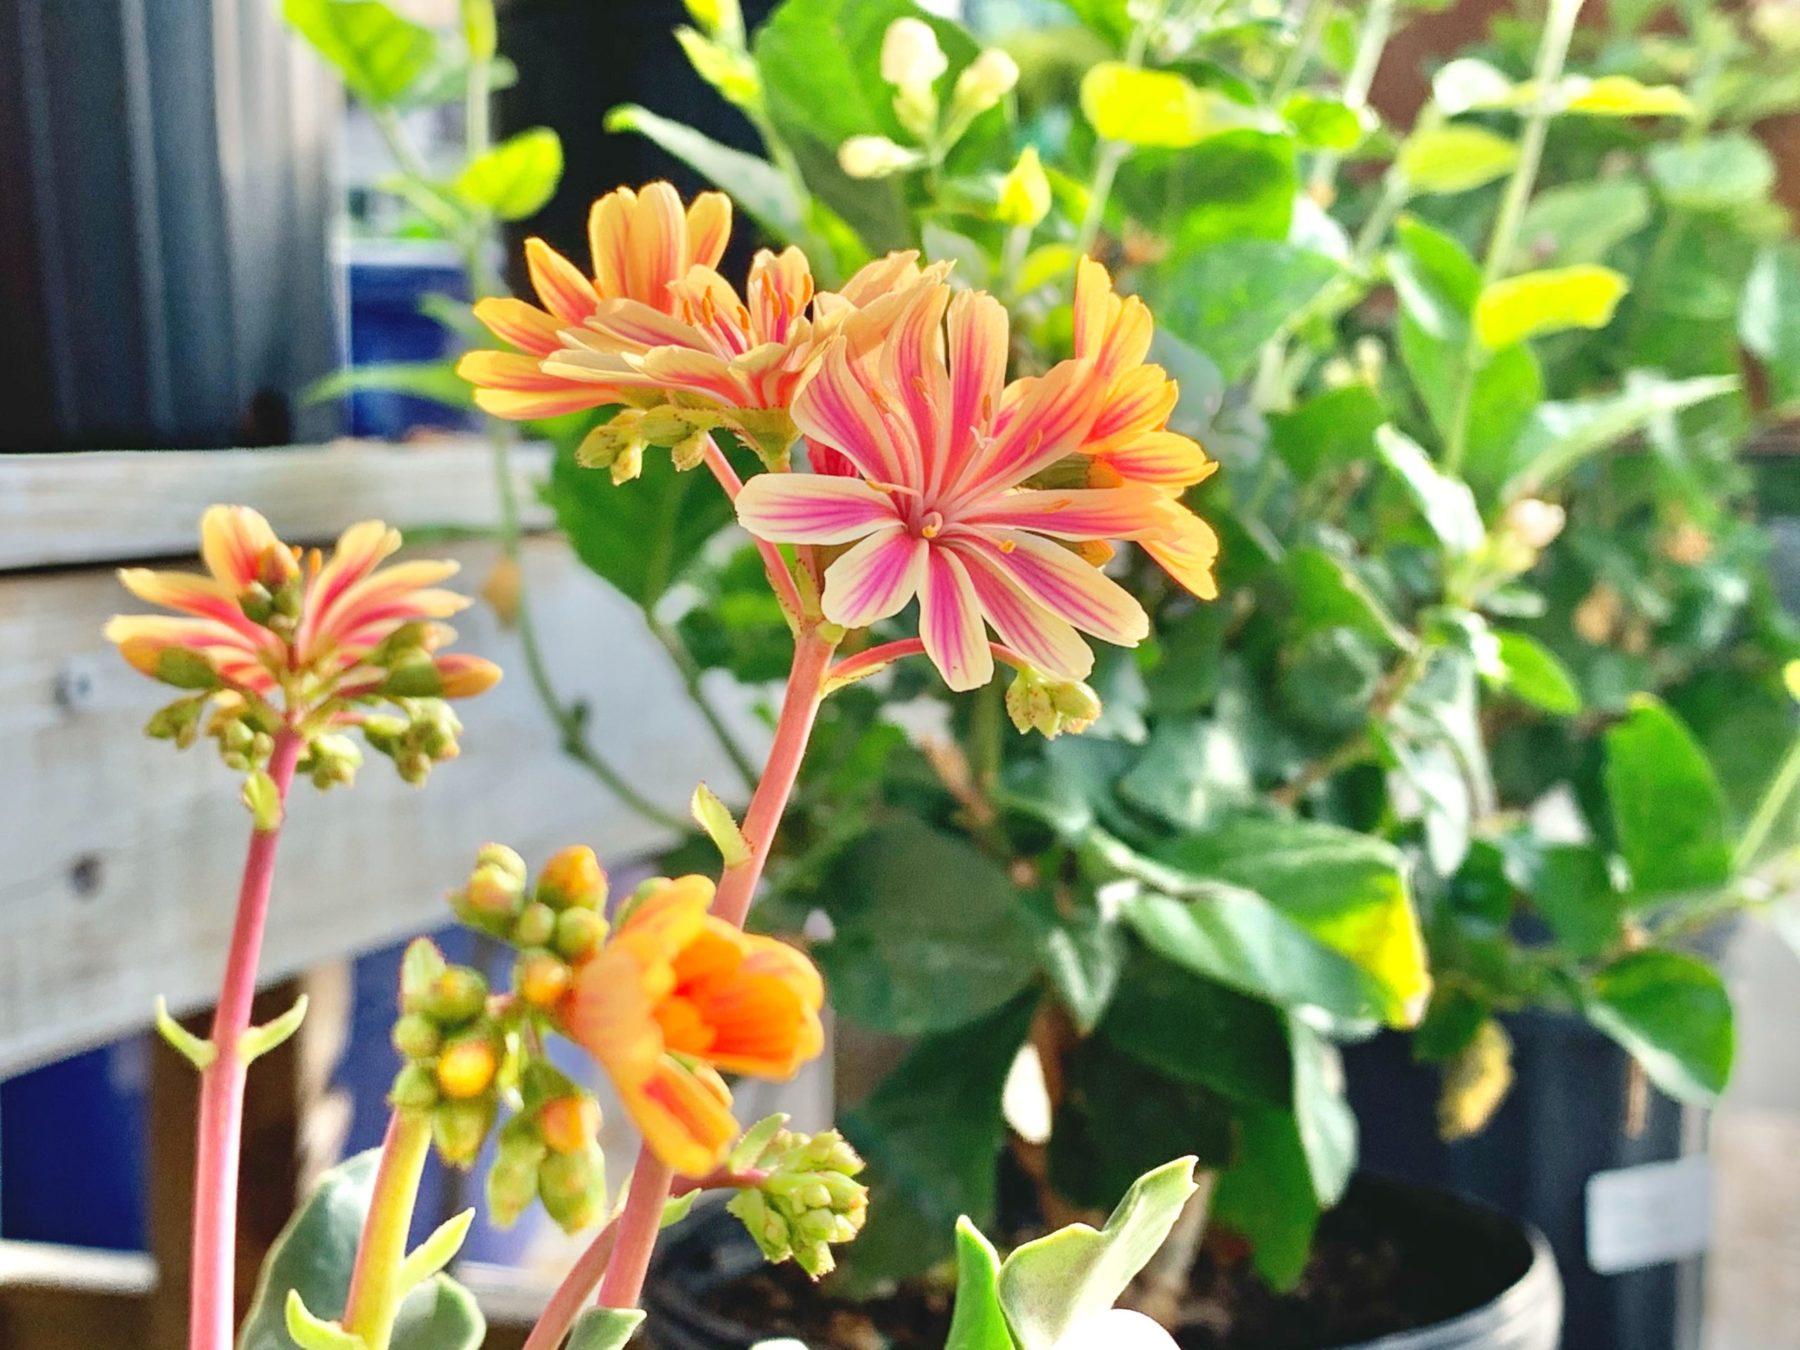 Greenstreet.Orange.Flower.03.30.2020